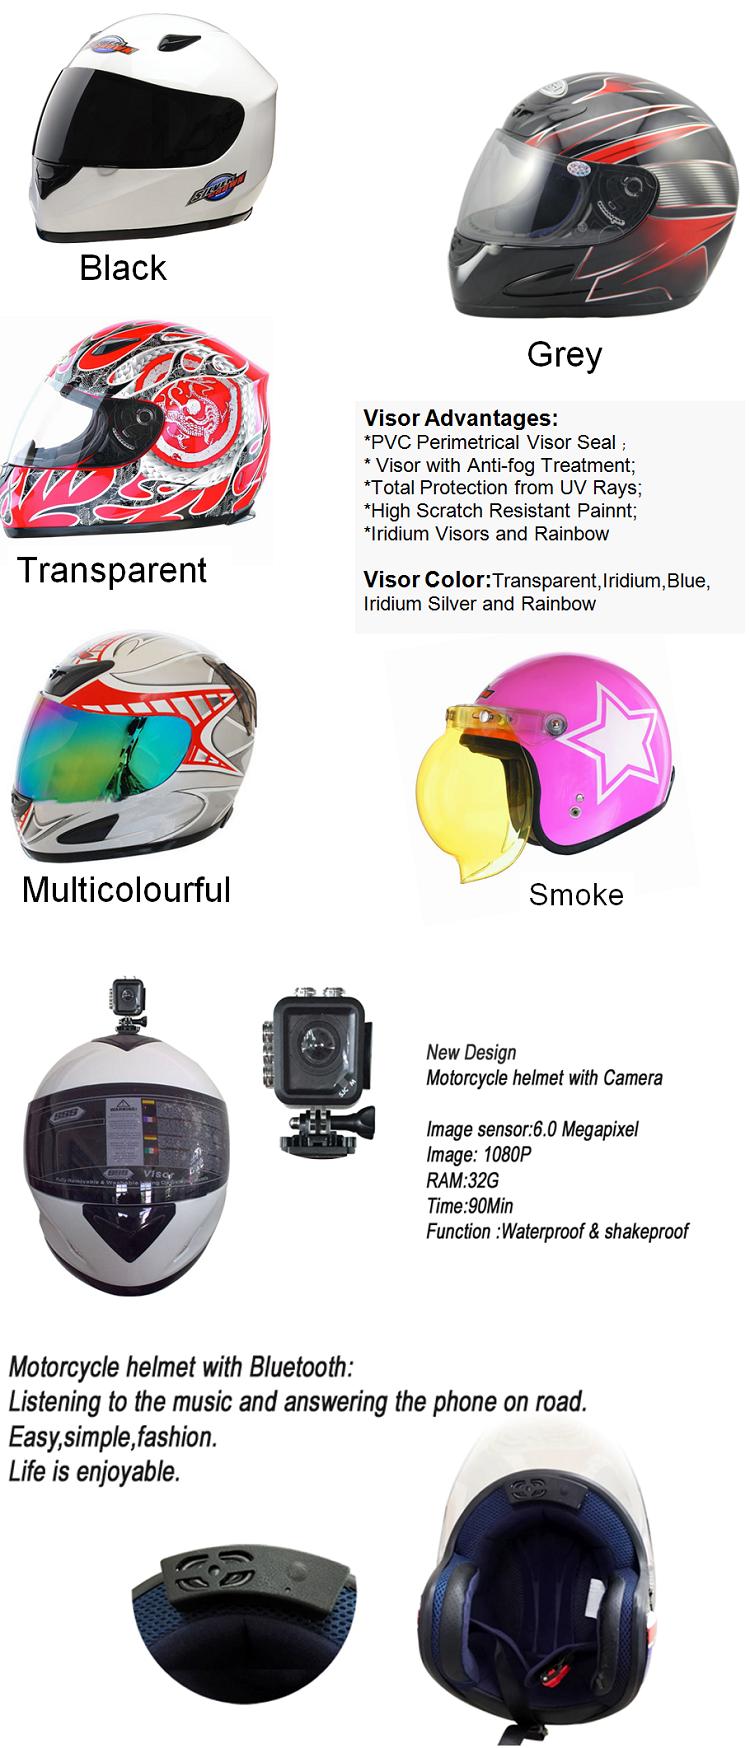 Popular Teenagers Streamline Design Skydiving Hang Glider Helmet For  Extreme Flying Sports - Buy Hang Glider Helmet,Glider Helmet,Skydiving  Glider